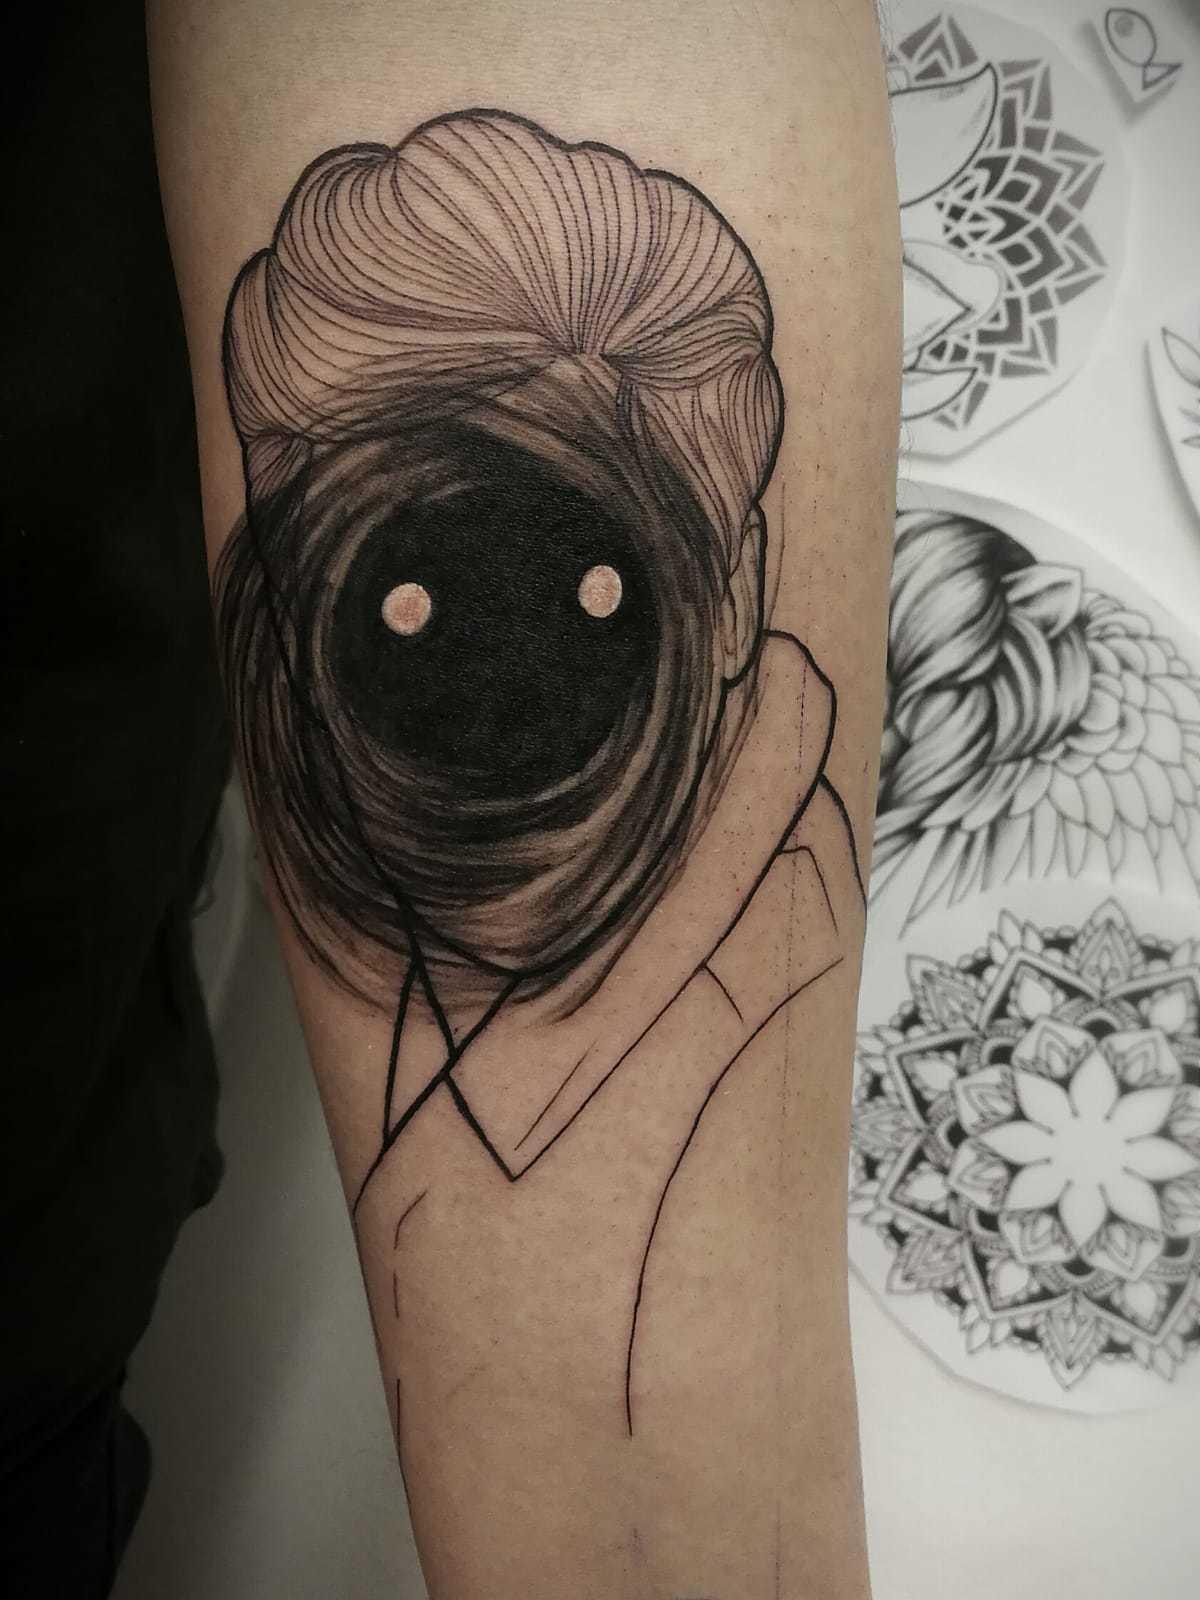 Ligera-ink-tattoo-milano-tatuaggi-milano-migliori-tatuatori-milano-tatuaggi-blackwork-milano-tattoo-blackwork-milano-tattoo-avangarde-6